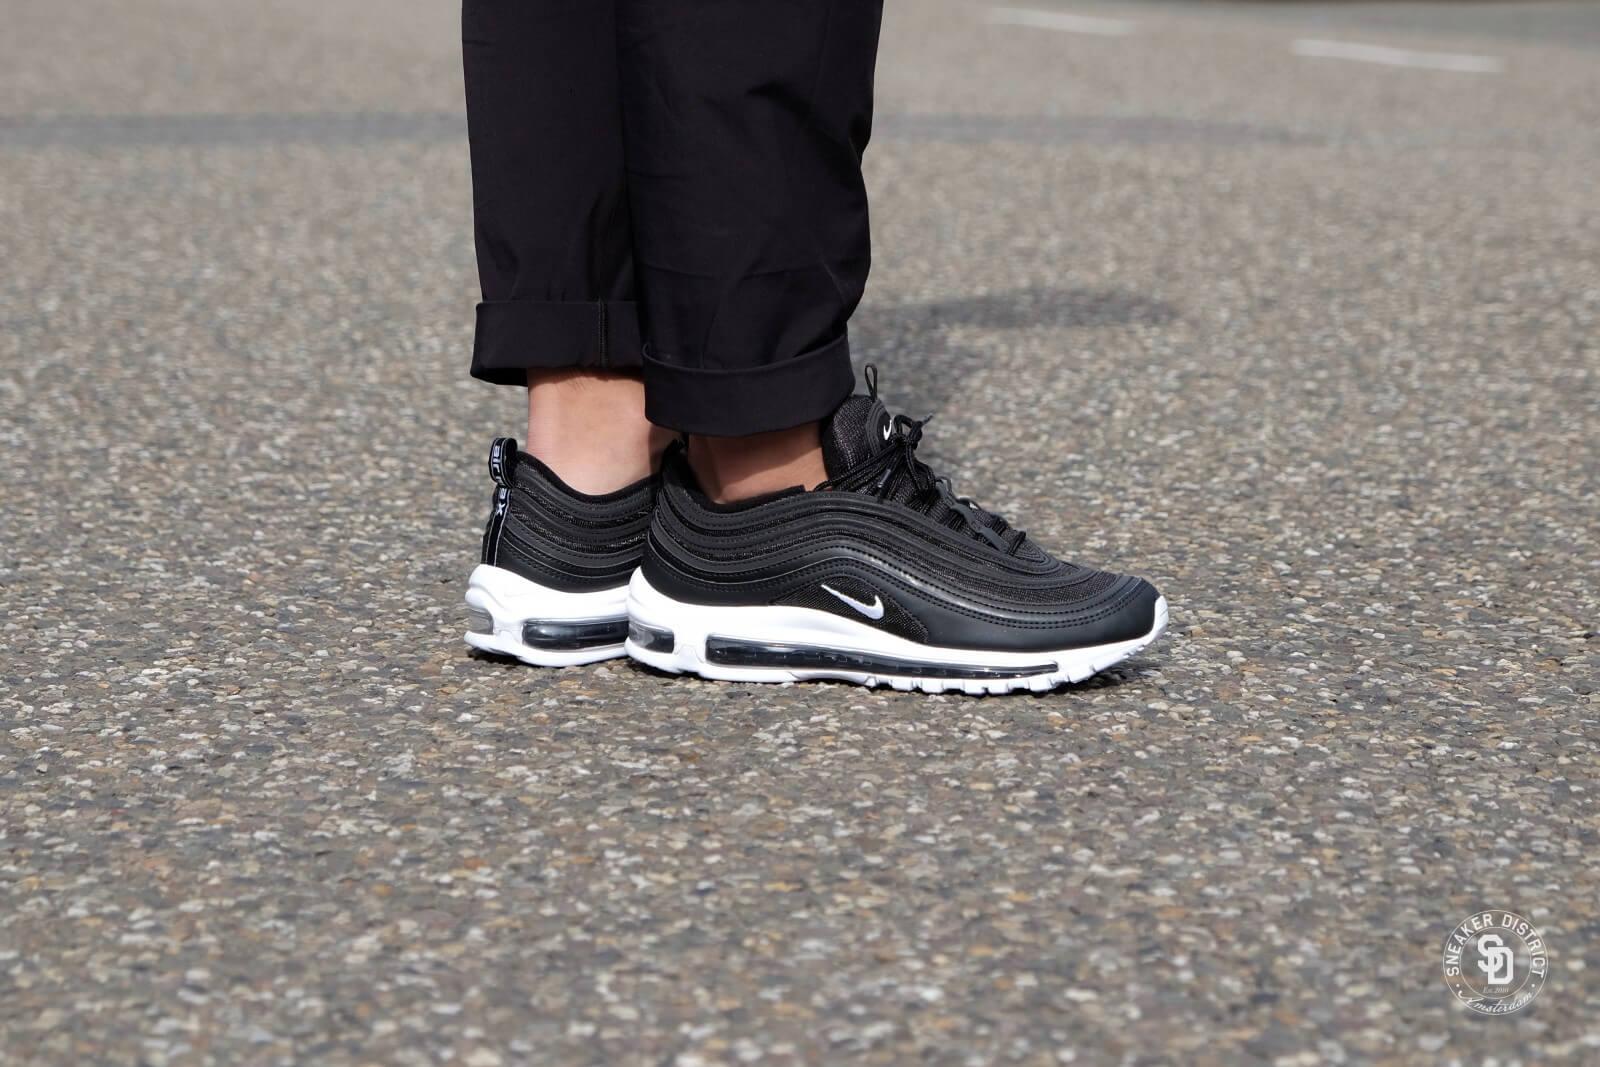 Nike Air Max 97 Black White 921826 003 Sneaker District